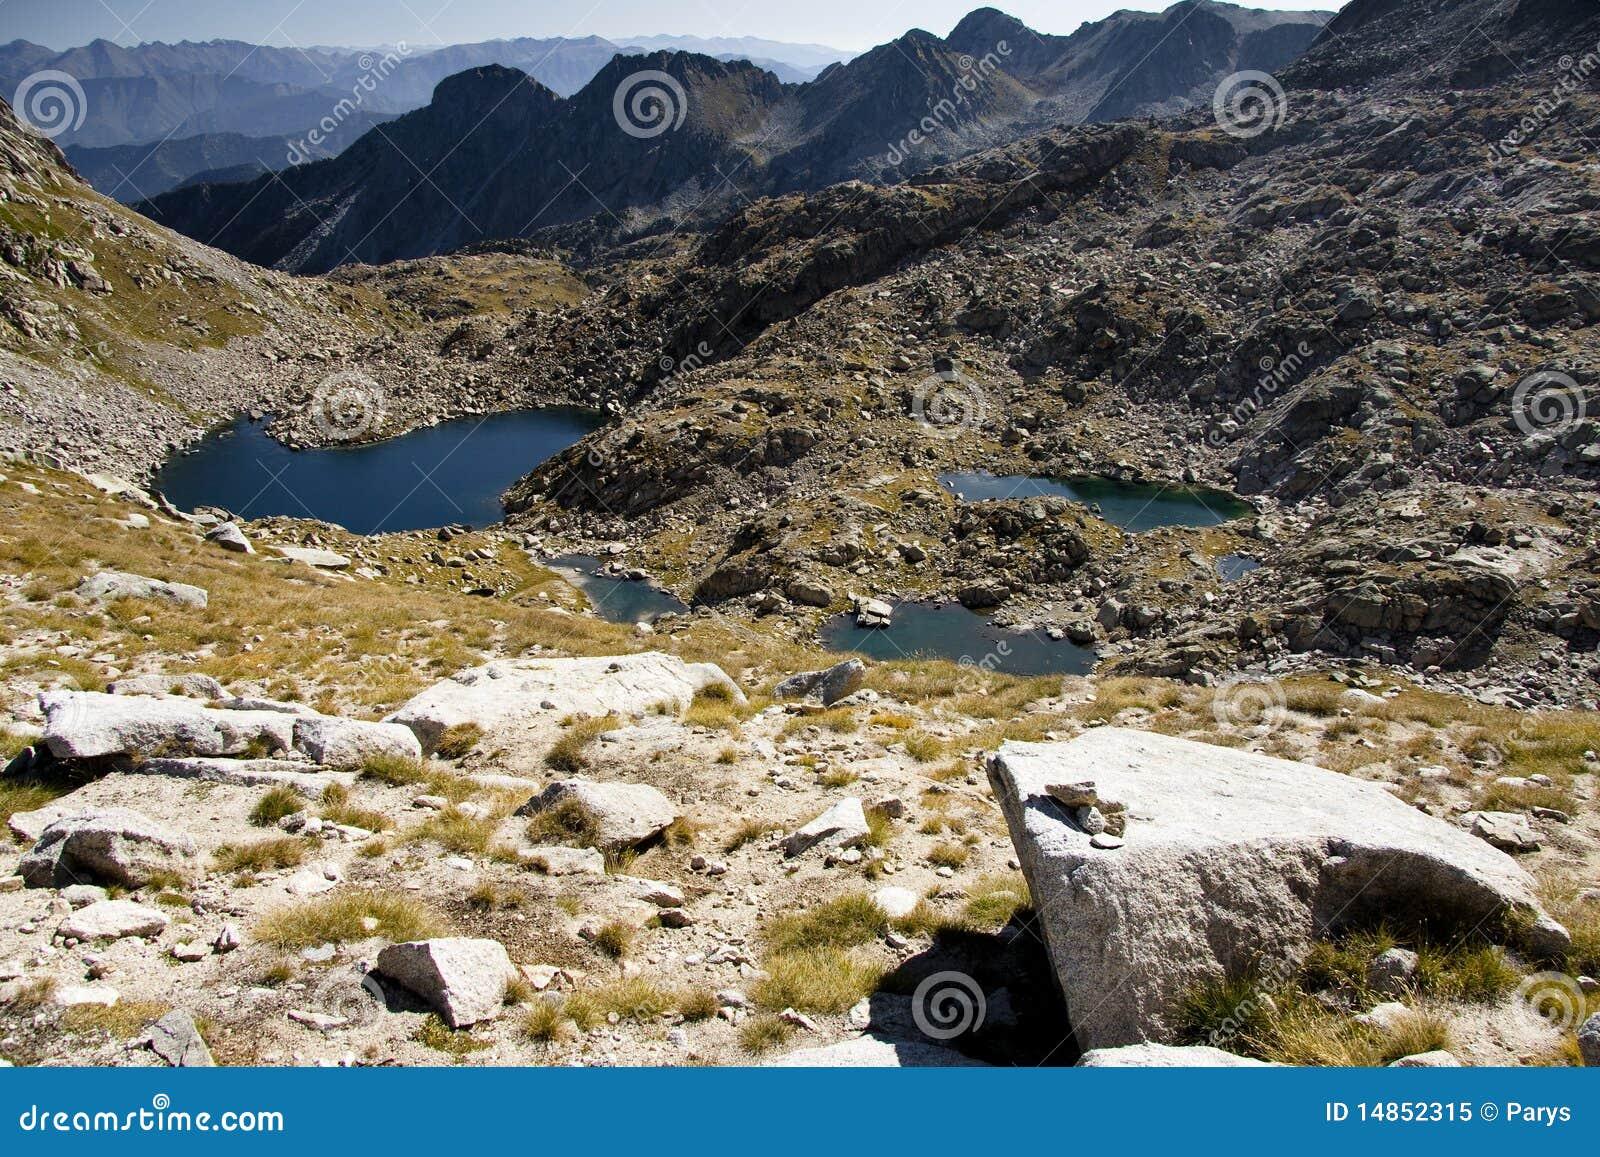 Aiguestortes national park - spain. Autumn day